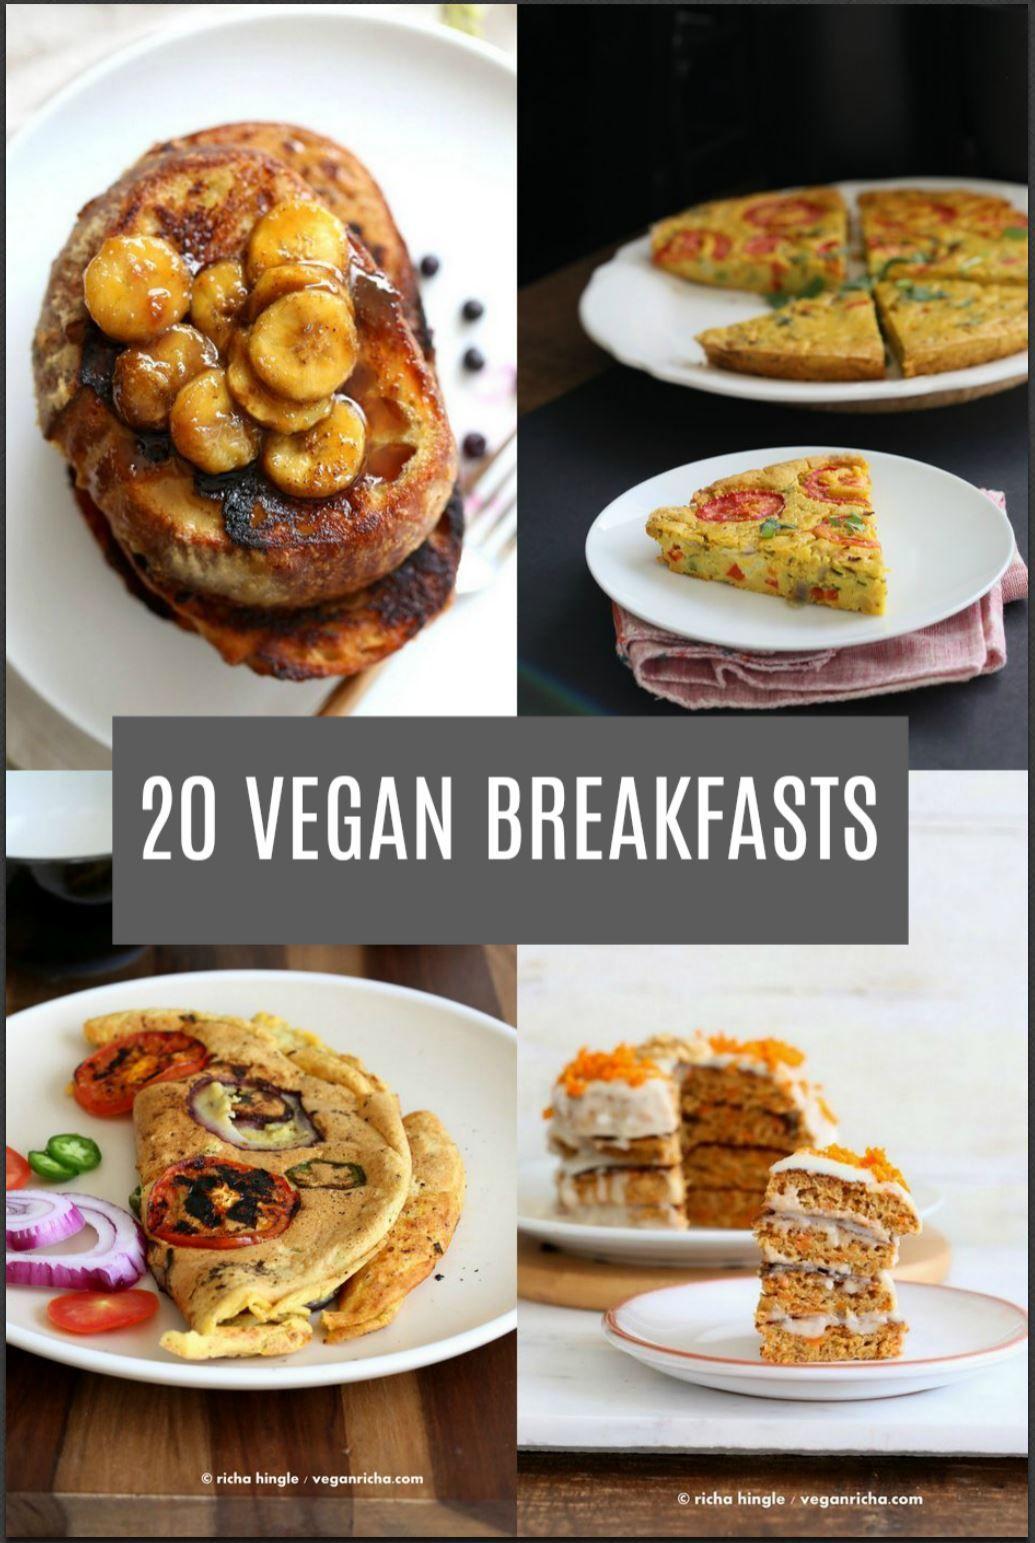 20 Delicious Vegan Breakfast Recipes. Savory & Sweet Breakfast Ideas for everyday vegan Breakfasts. Scrambles, Frittata, pancakes. Gluten-free Soy-free options.